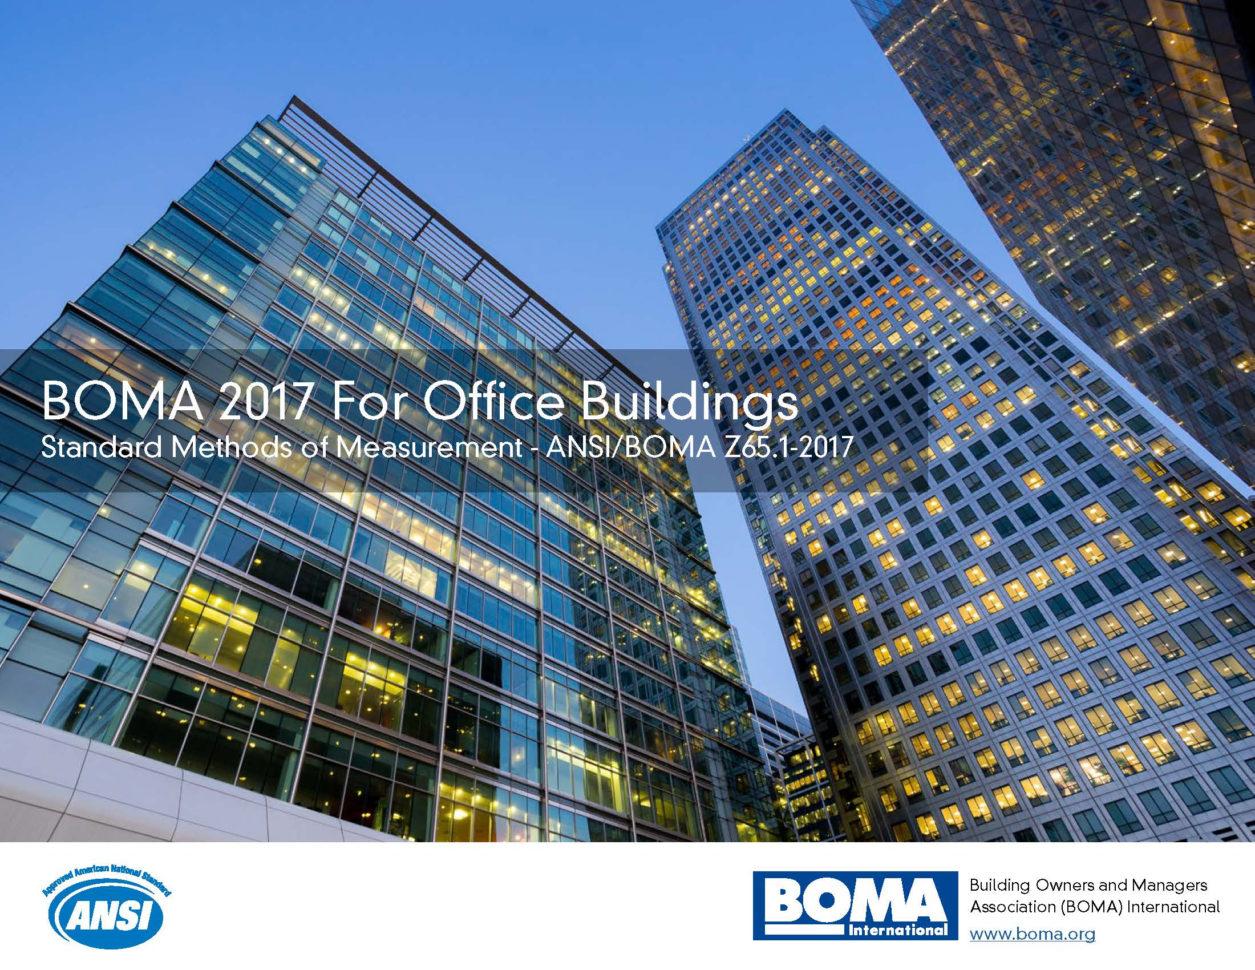 boma 2010 spreadsheet  Boma 2010 Spreadsheet For Office Buildings Boma 2010 Spreadsheet Printable Spreadshee